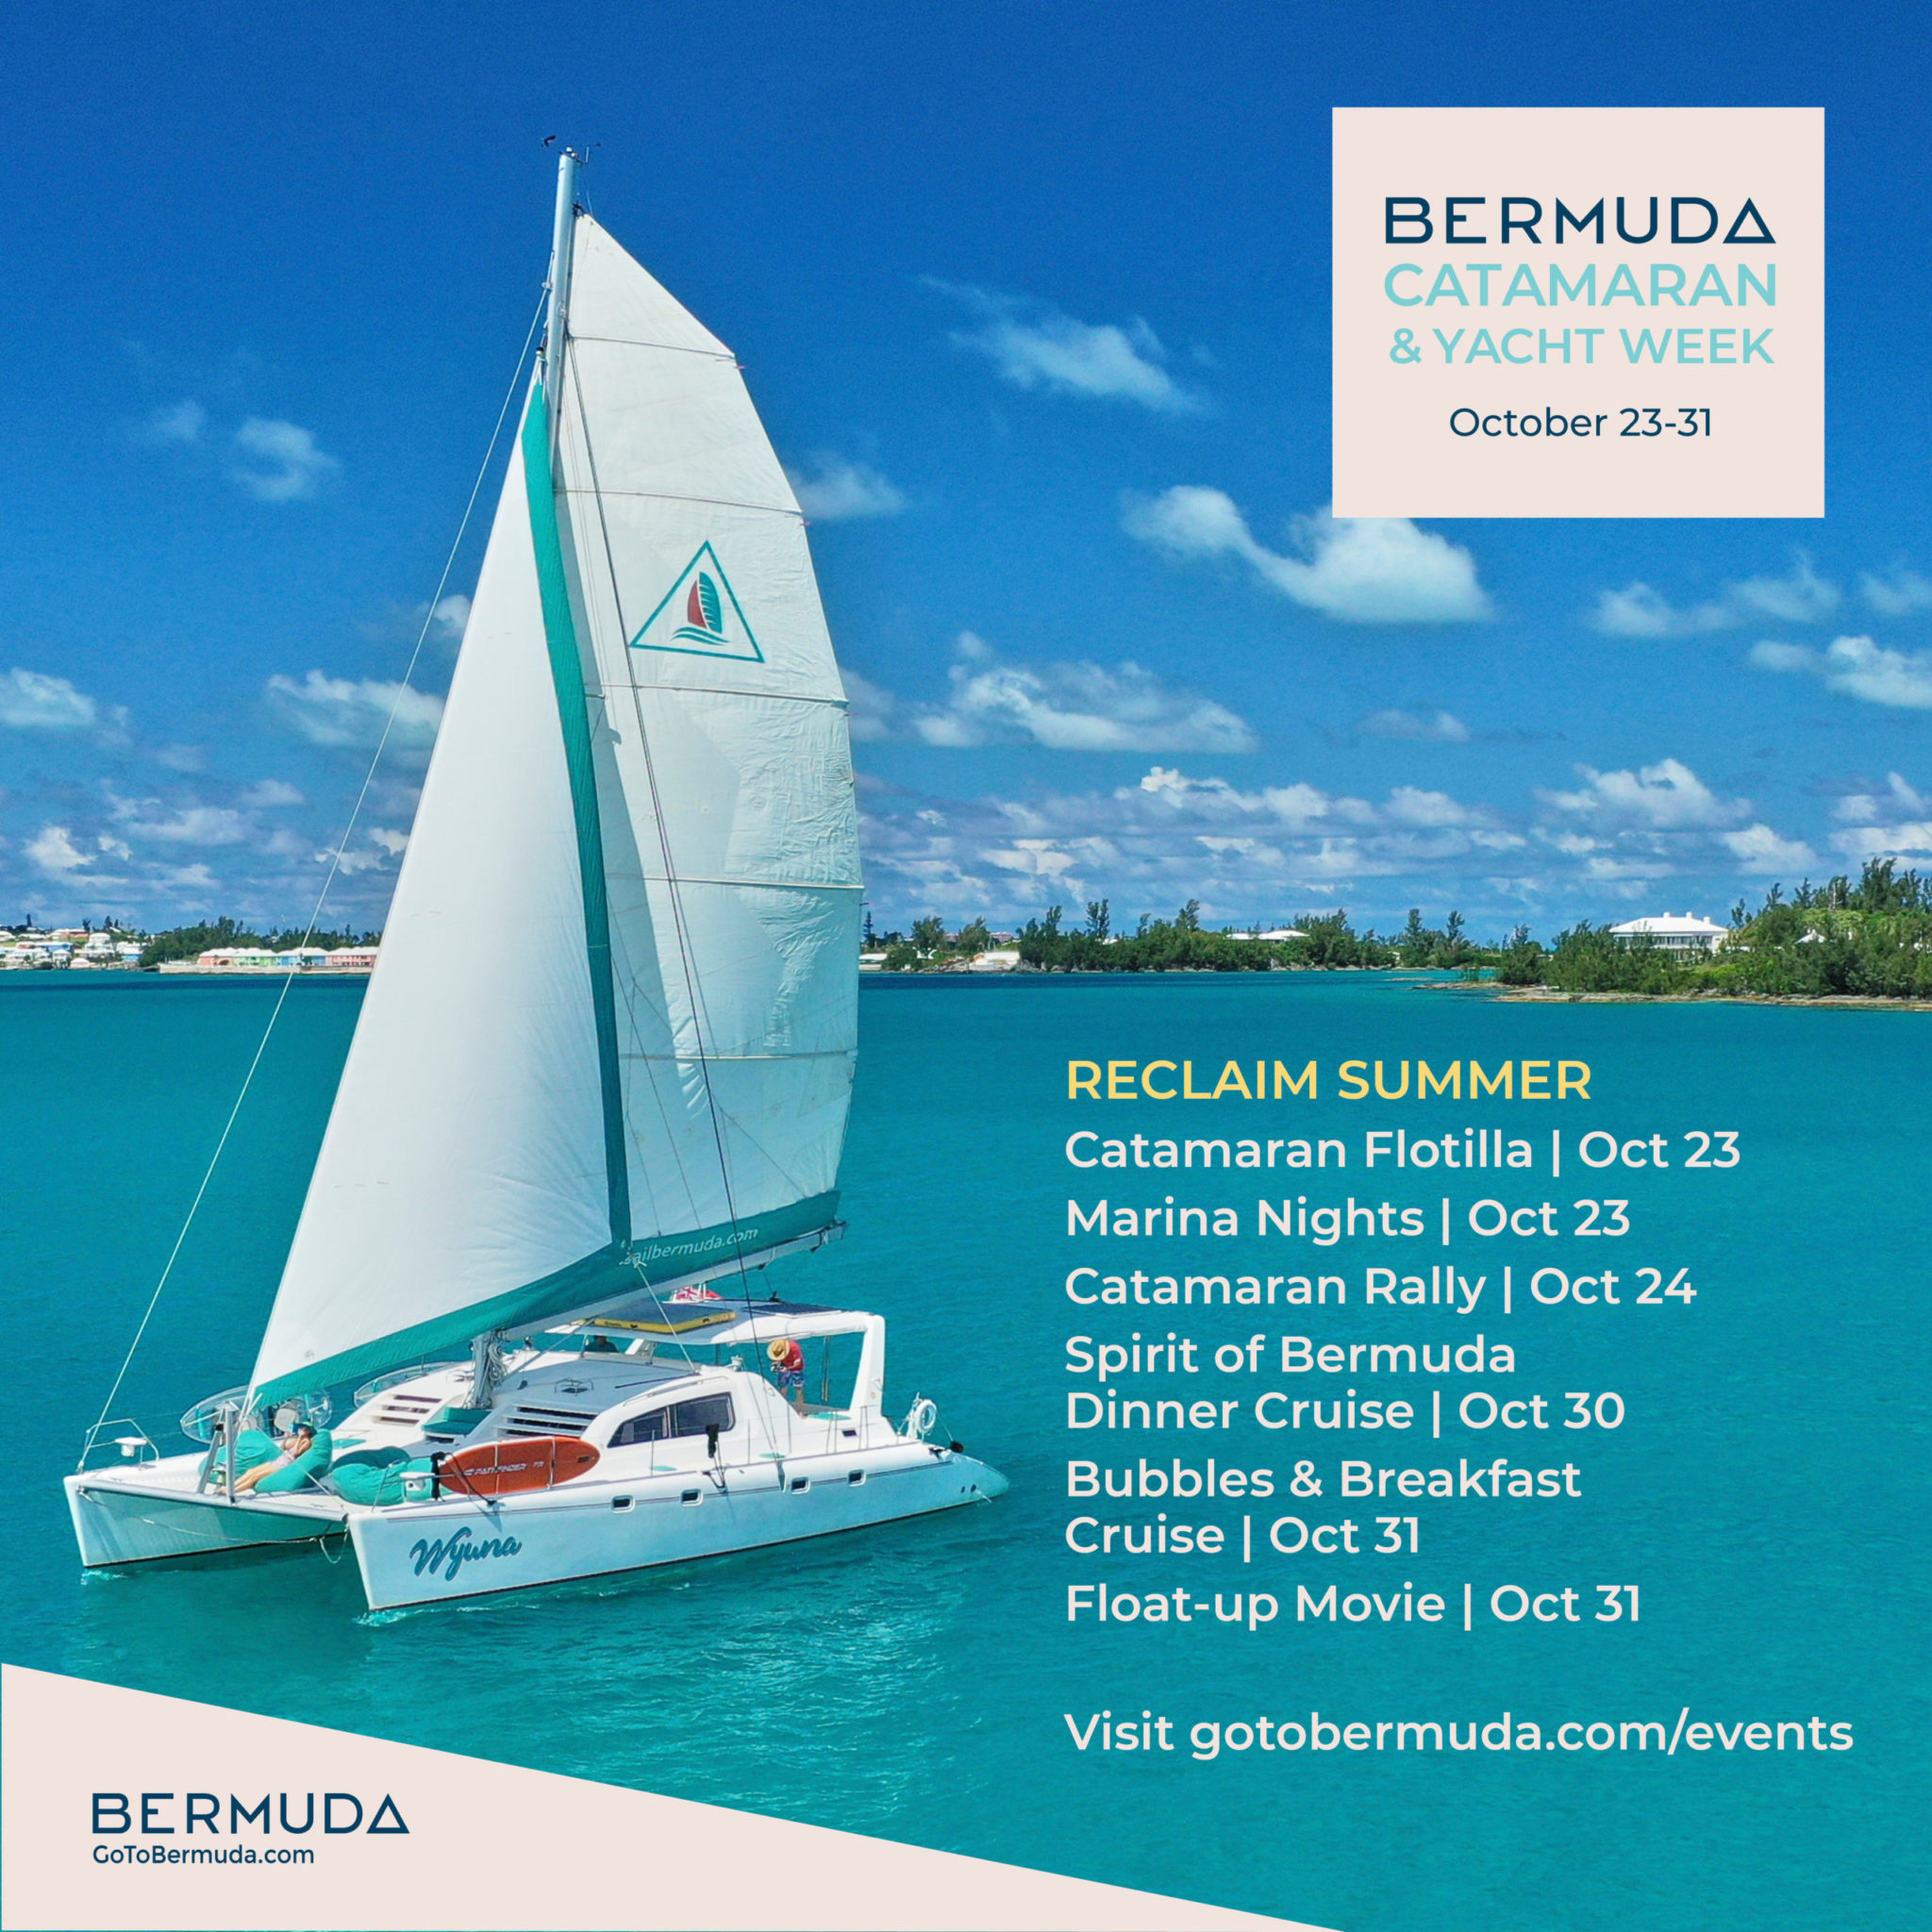 Bermuda Catamaran